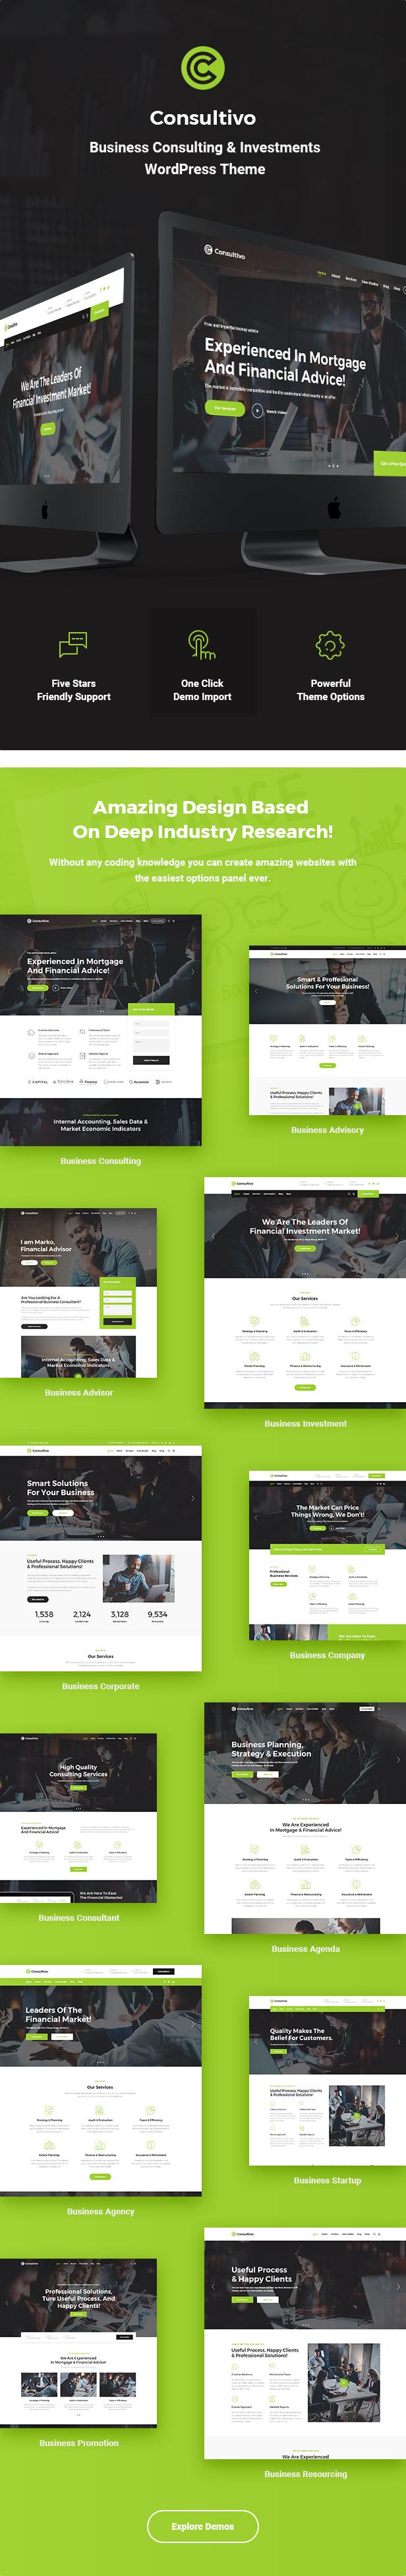 Consultivo - Unternehmensberatung und Investitionen WordPress Theme - 5